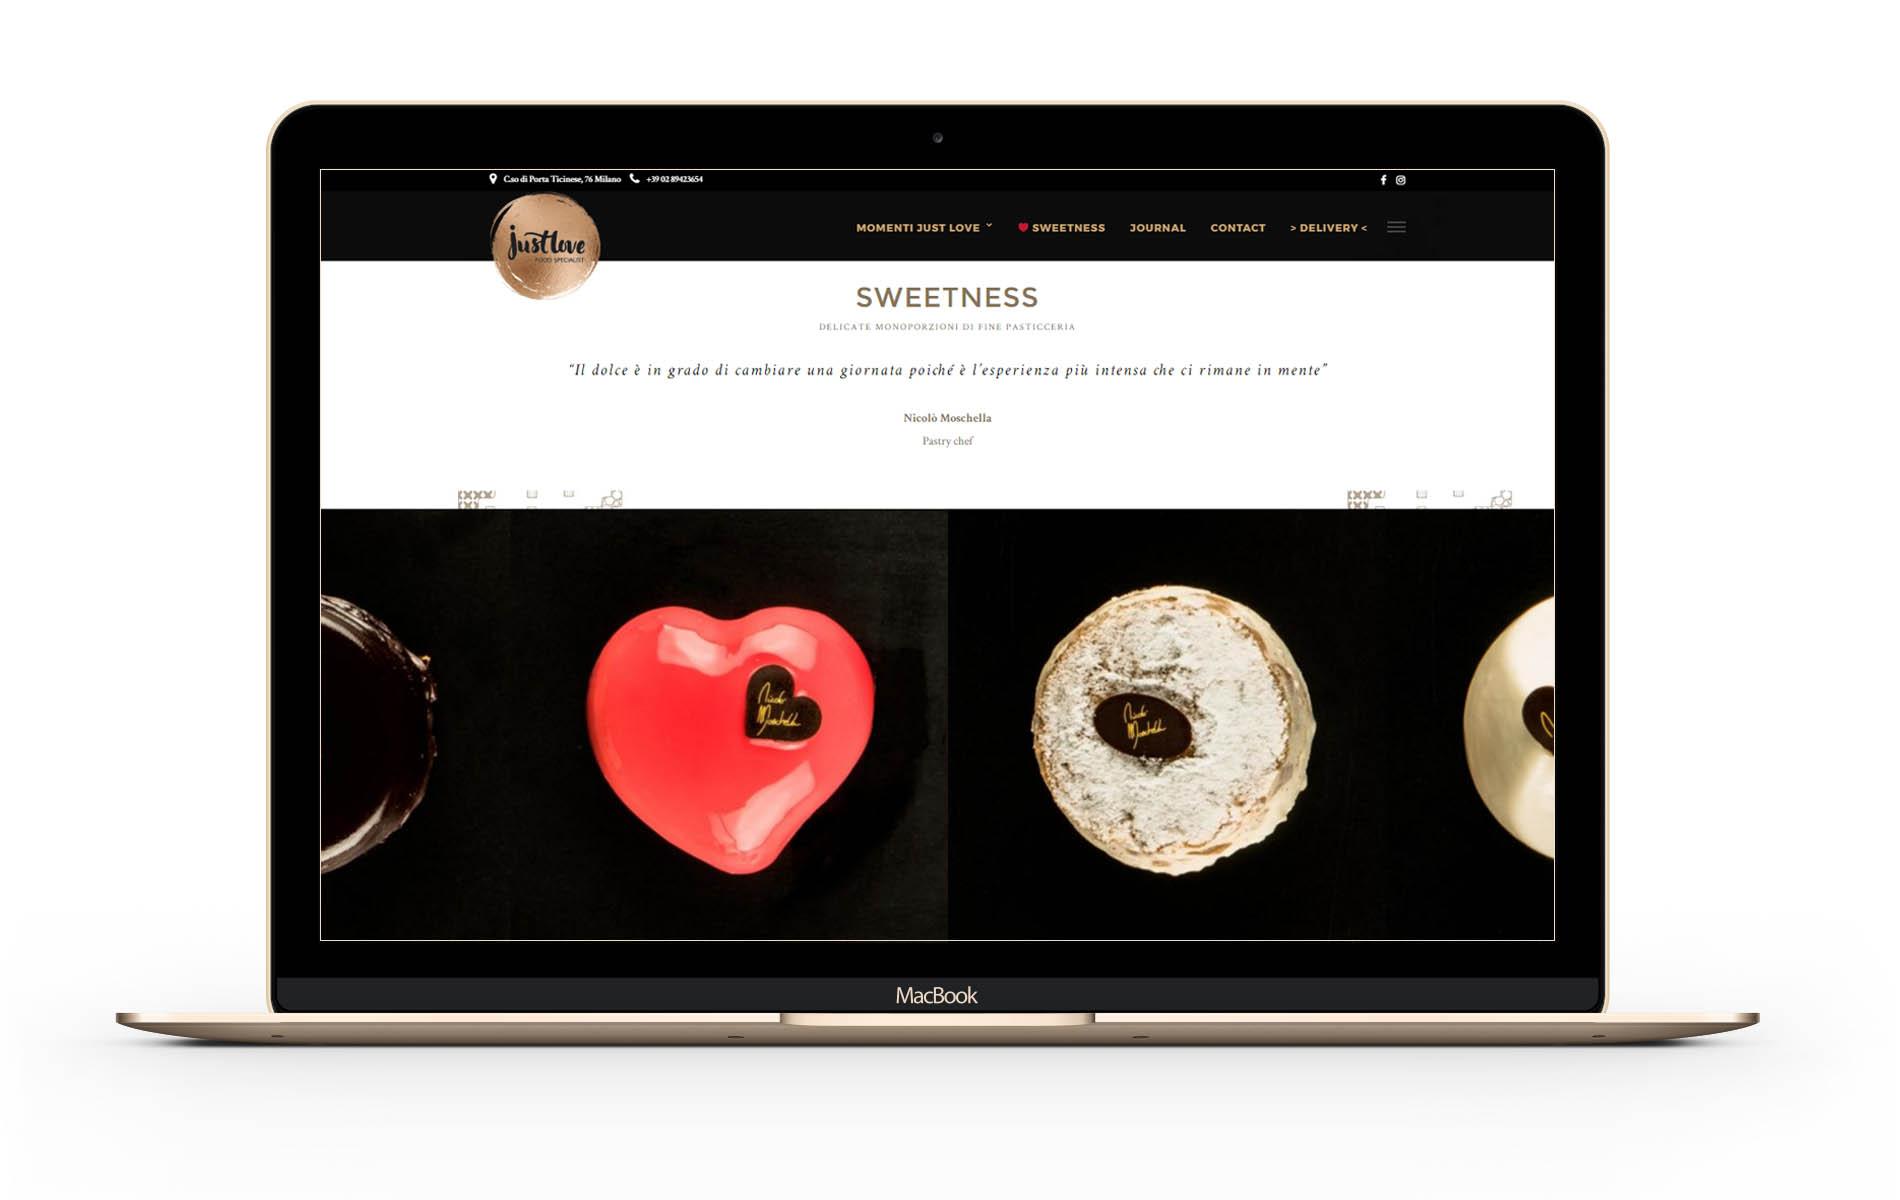 mintlab-brandidentity-justlove-mockup-web